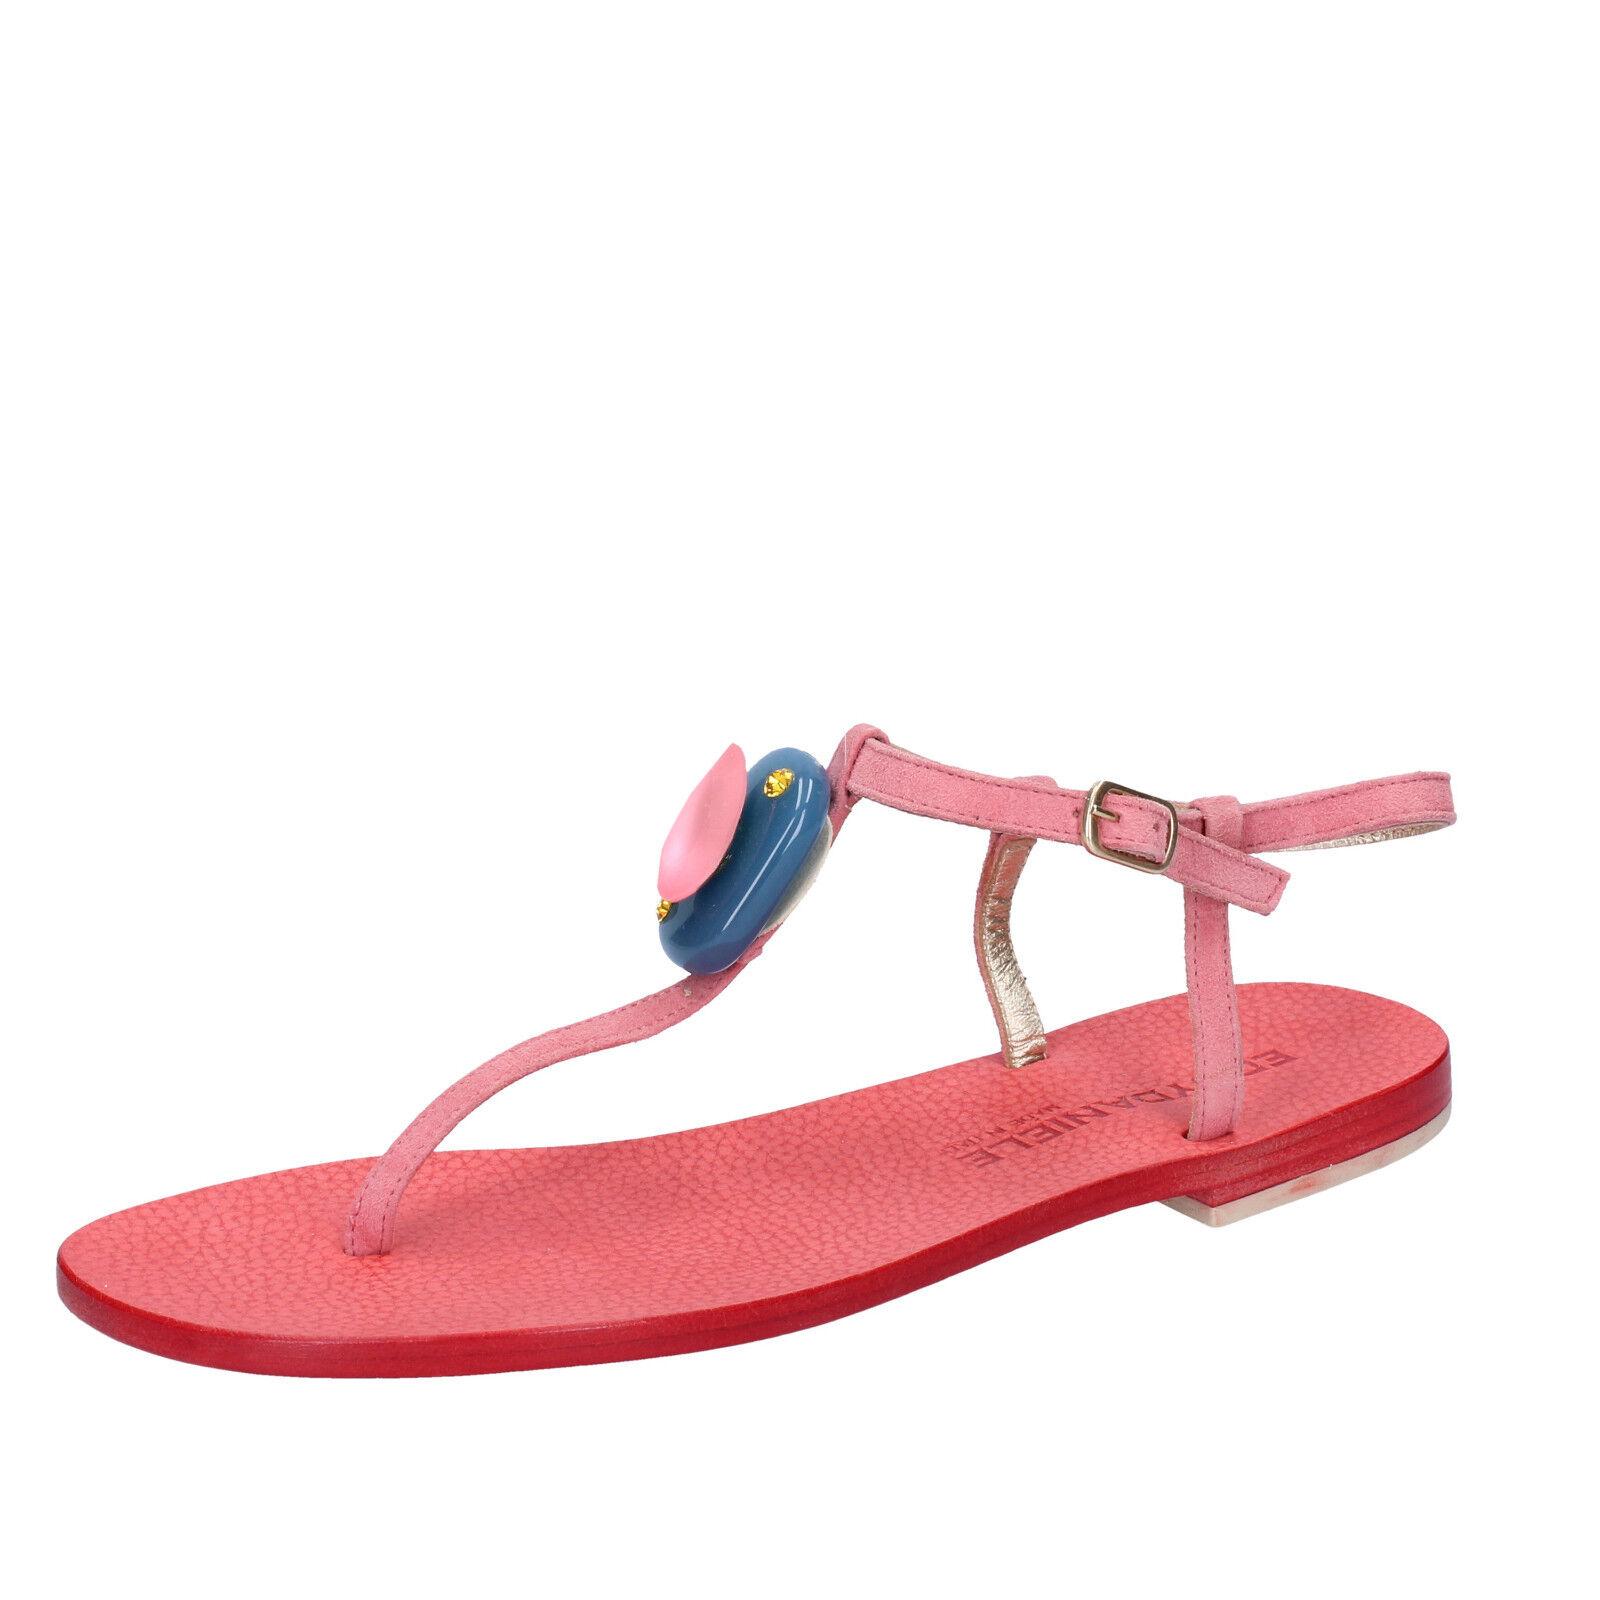 Damenss schuhe EDDY DANIELE 4 (EU 37) Sandales pink suede swarovski AX988